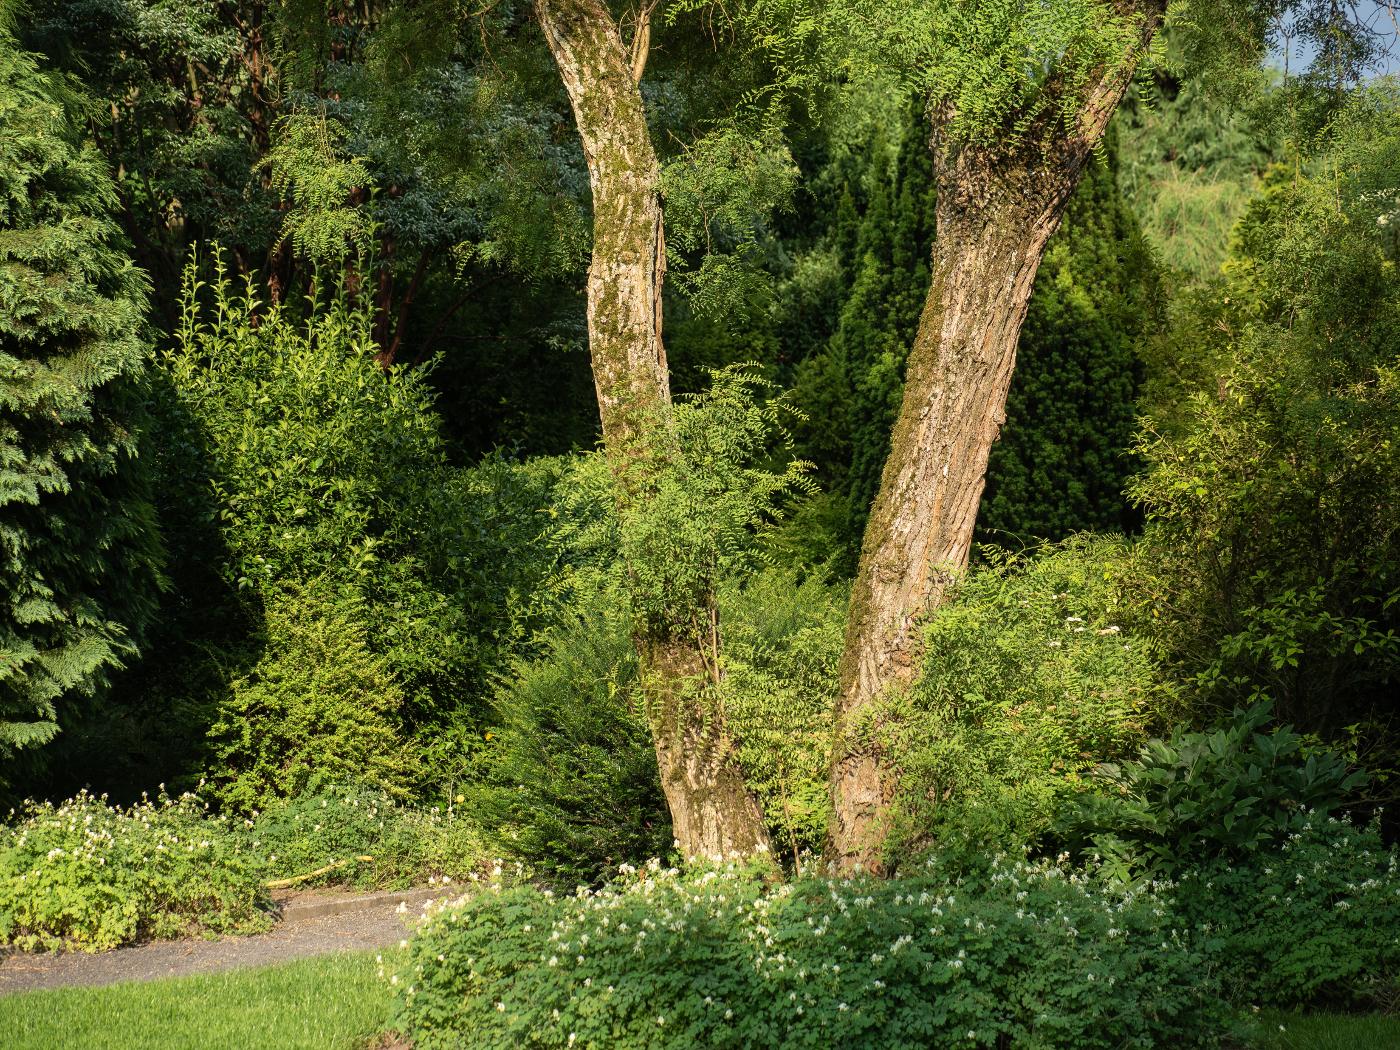 Arboretum Park Härle #3 |  © wolfgang röser